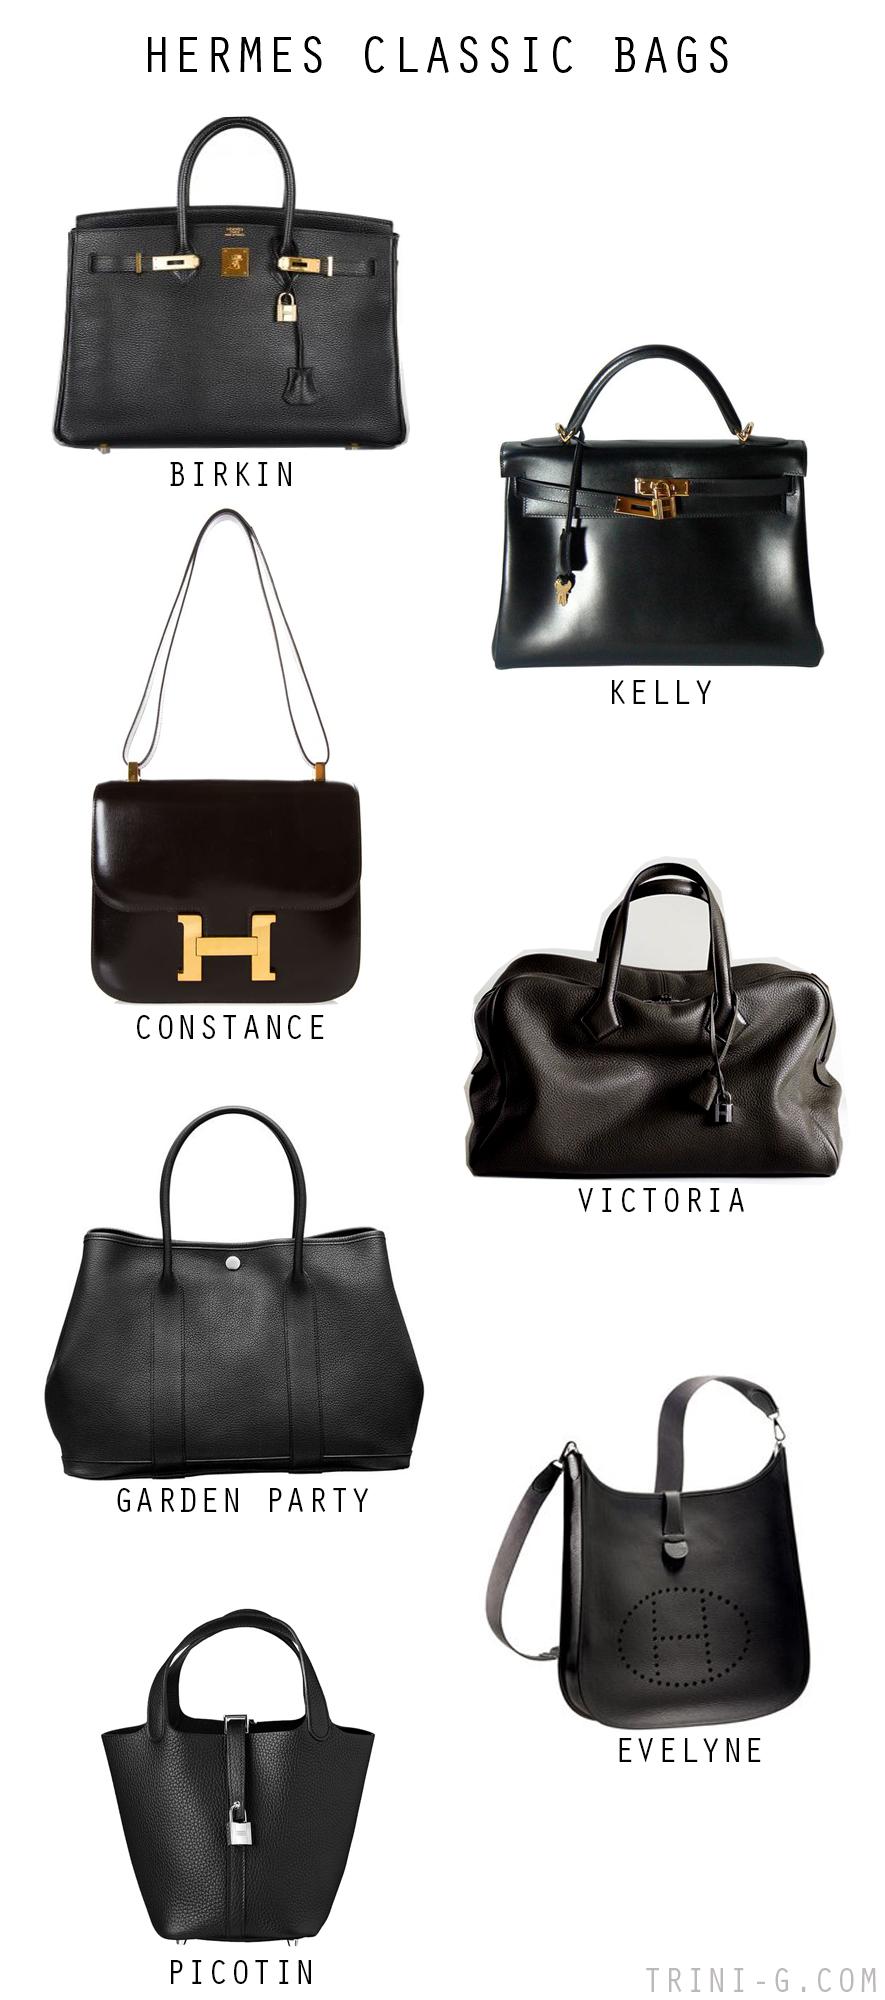 Trini Blog Hermes Classic Bags